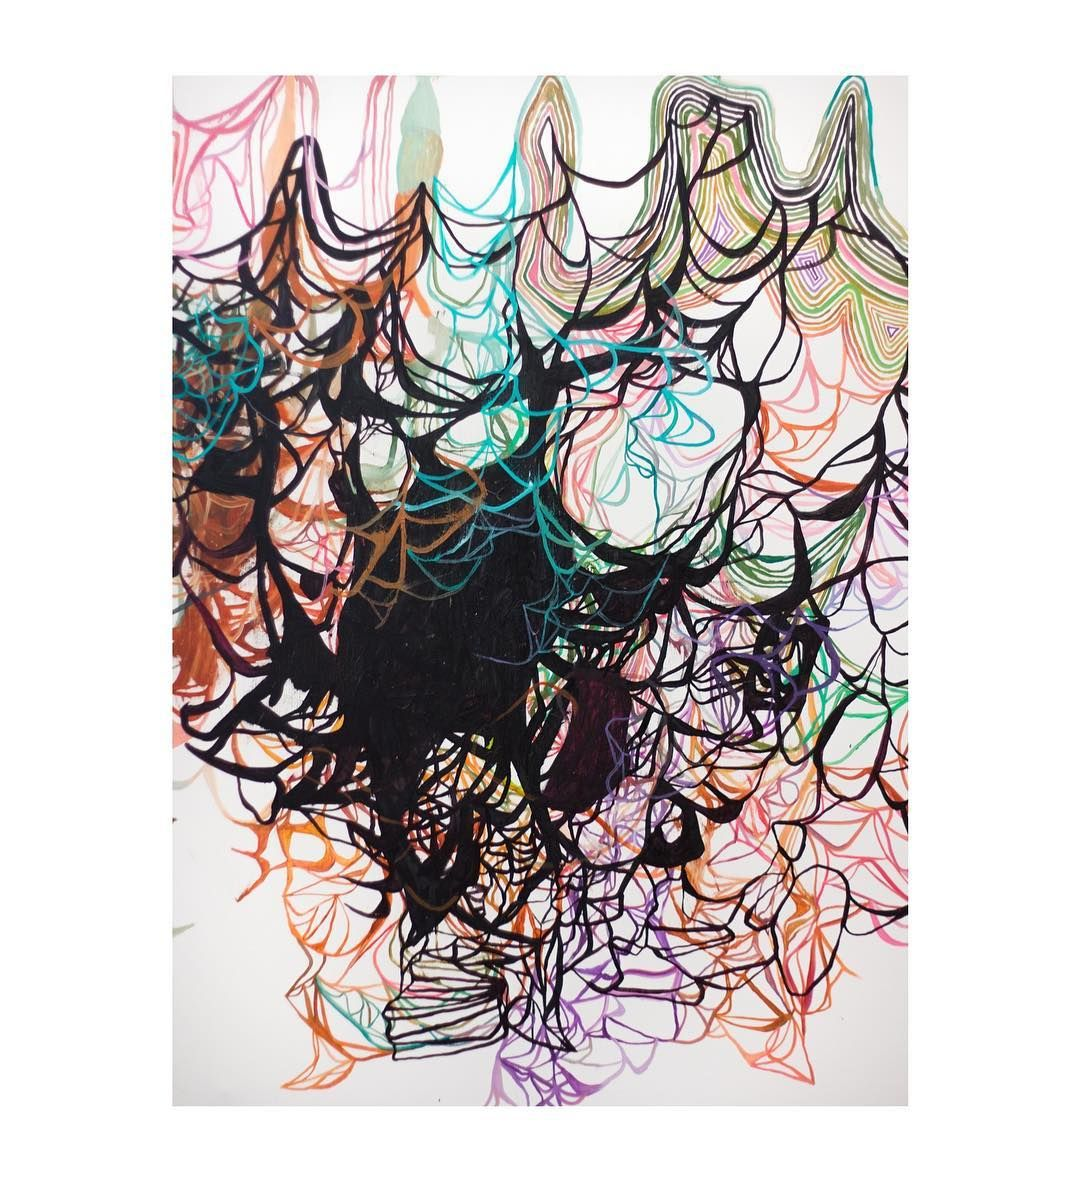 Olav Christopher Jessen at @gallerisusanneottesen. Full video from the opening see link in bio. #theExpedition #OlavChristopherJenssen #art #artist #gallery #artlandapp